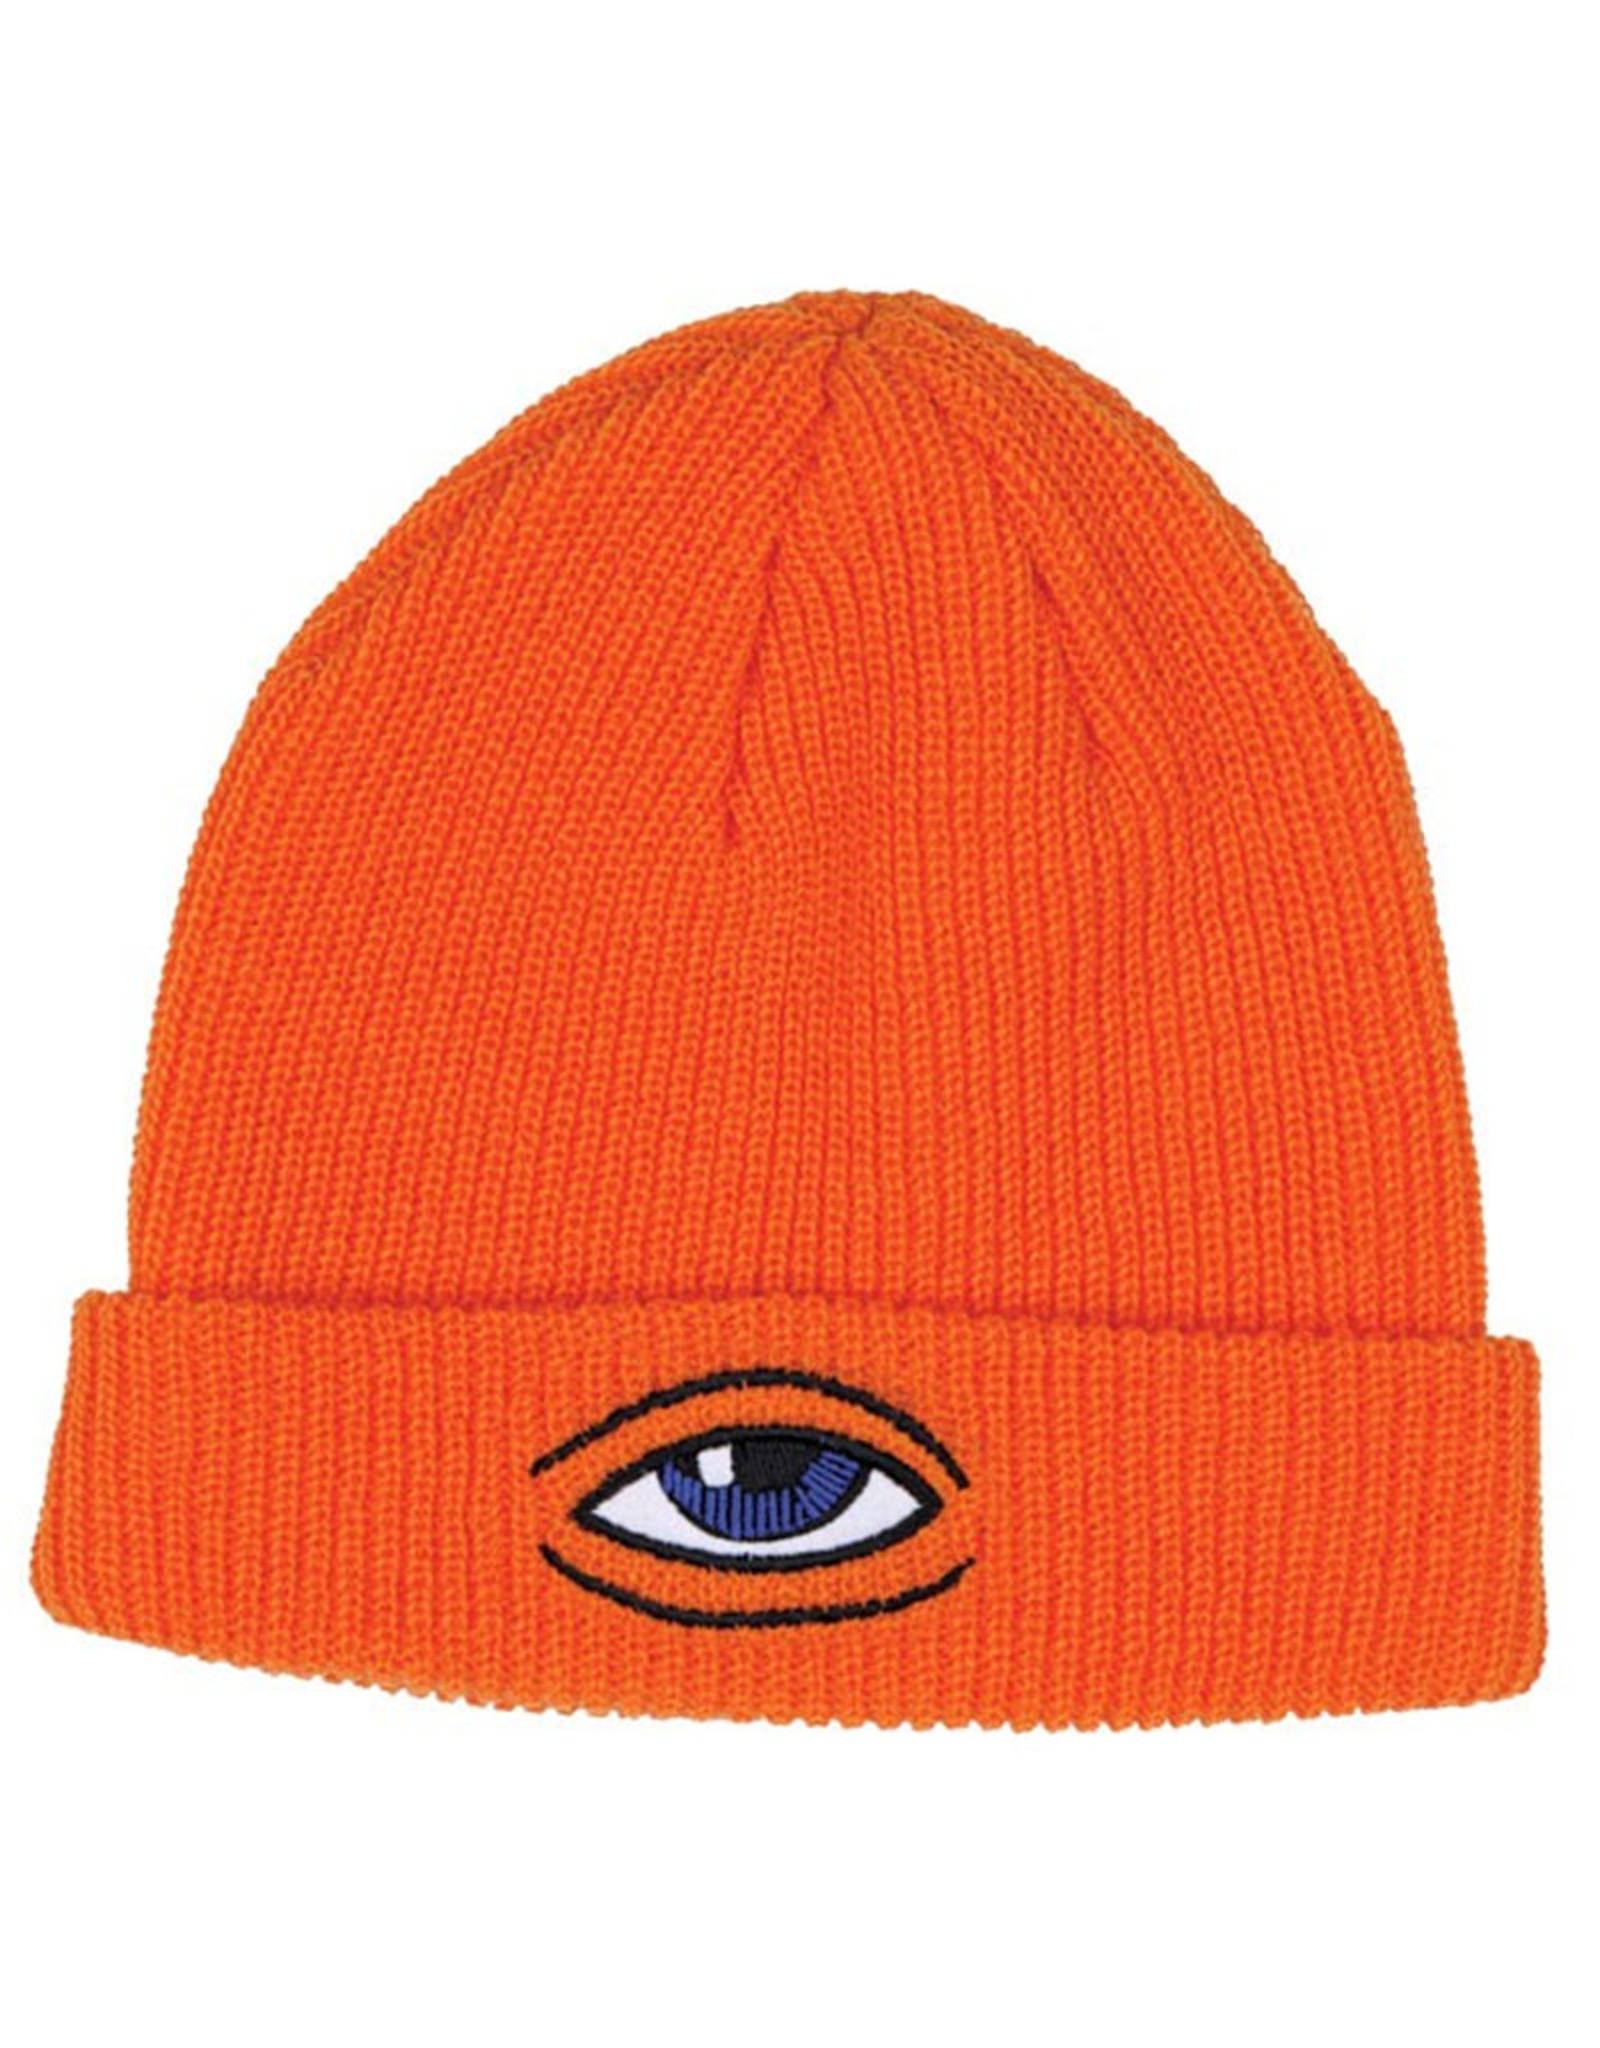 Toy Machine Toy Machine Beanie Sect Eye Dock Cuff (Orange)